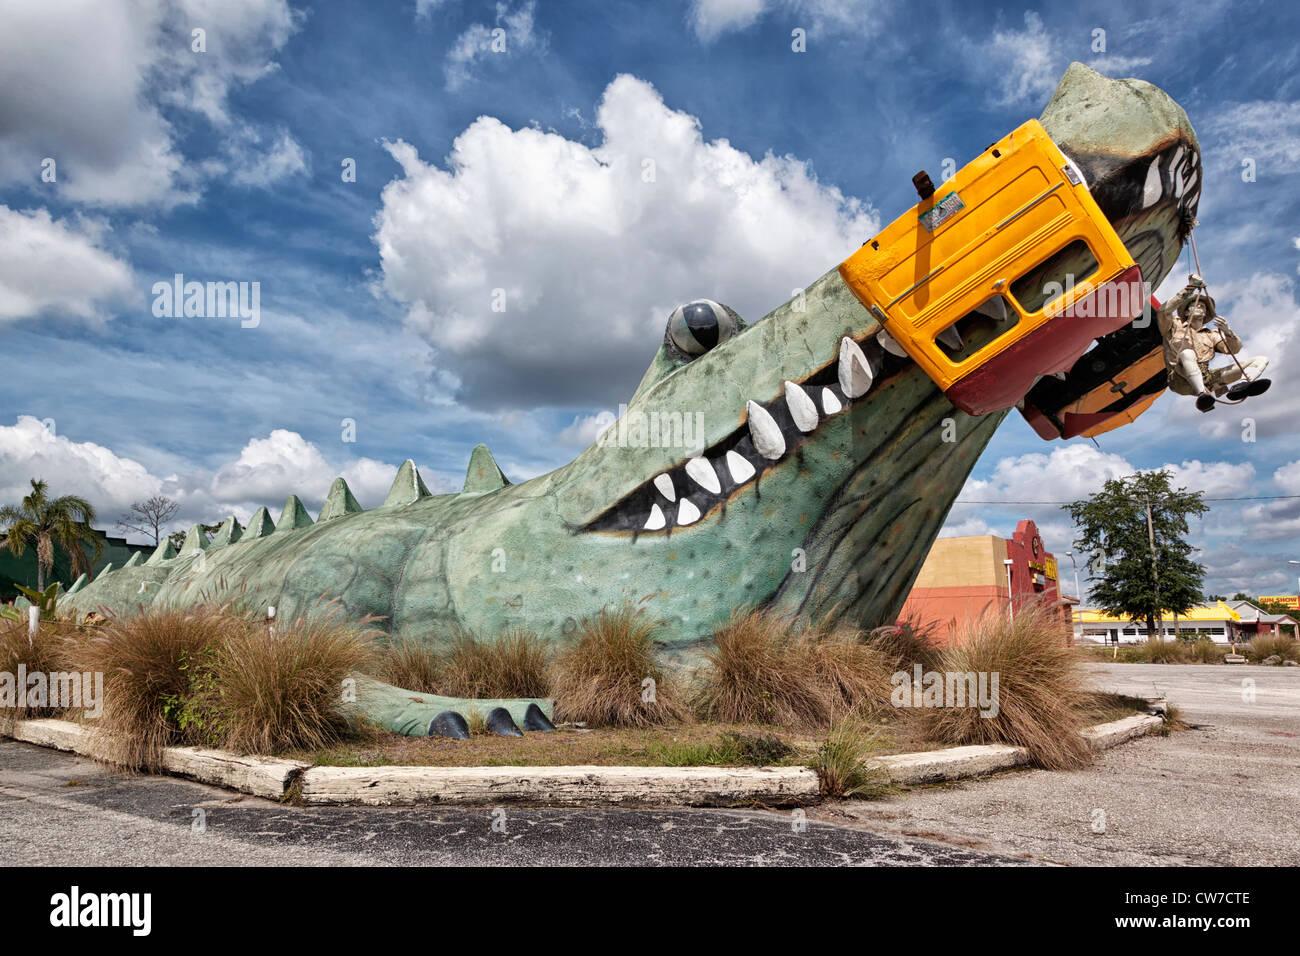 The large model Gator outside of Kissimmee's Gator Motel - Stock Image